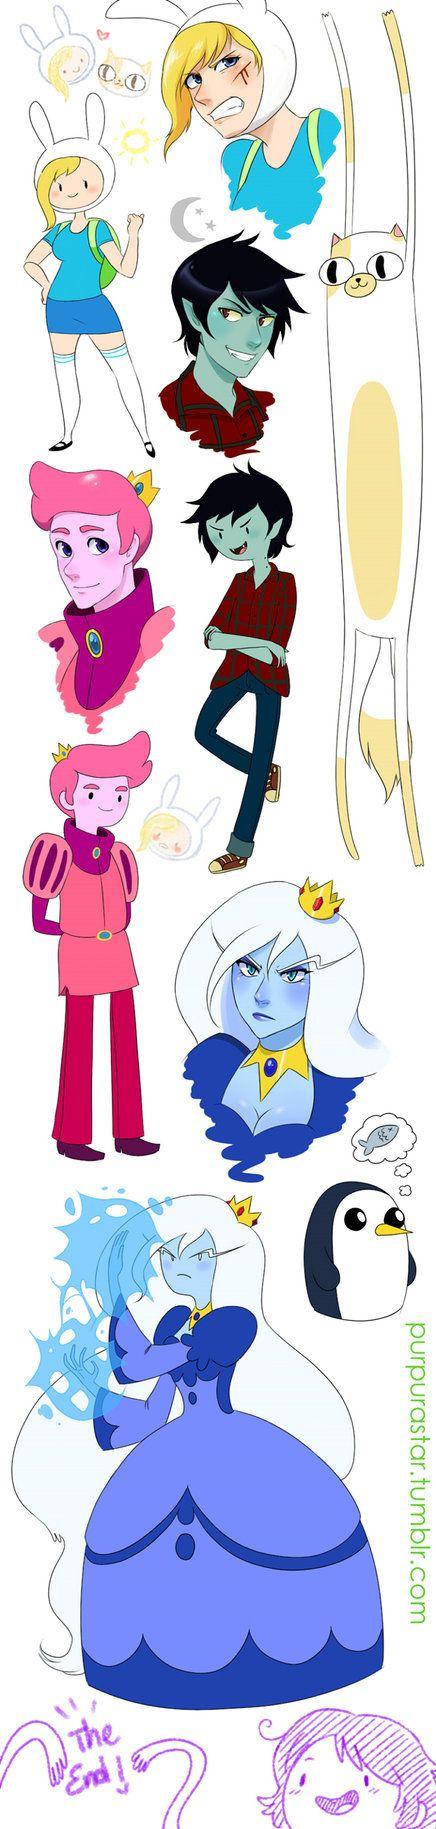 Adventure time Genderbend dump by ~Purple-Star-6 on deviantART